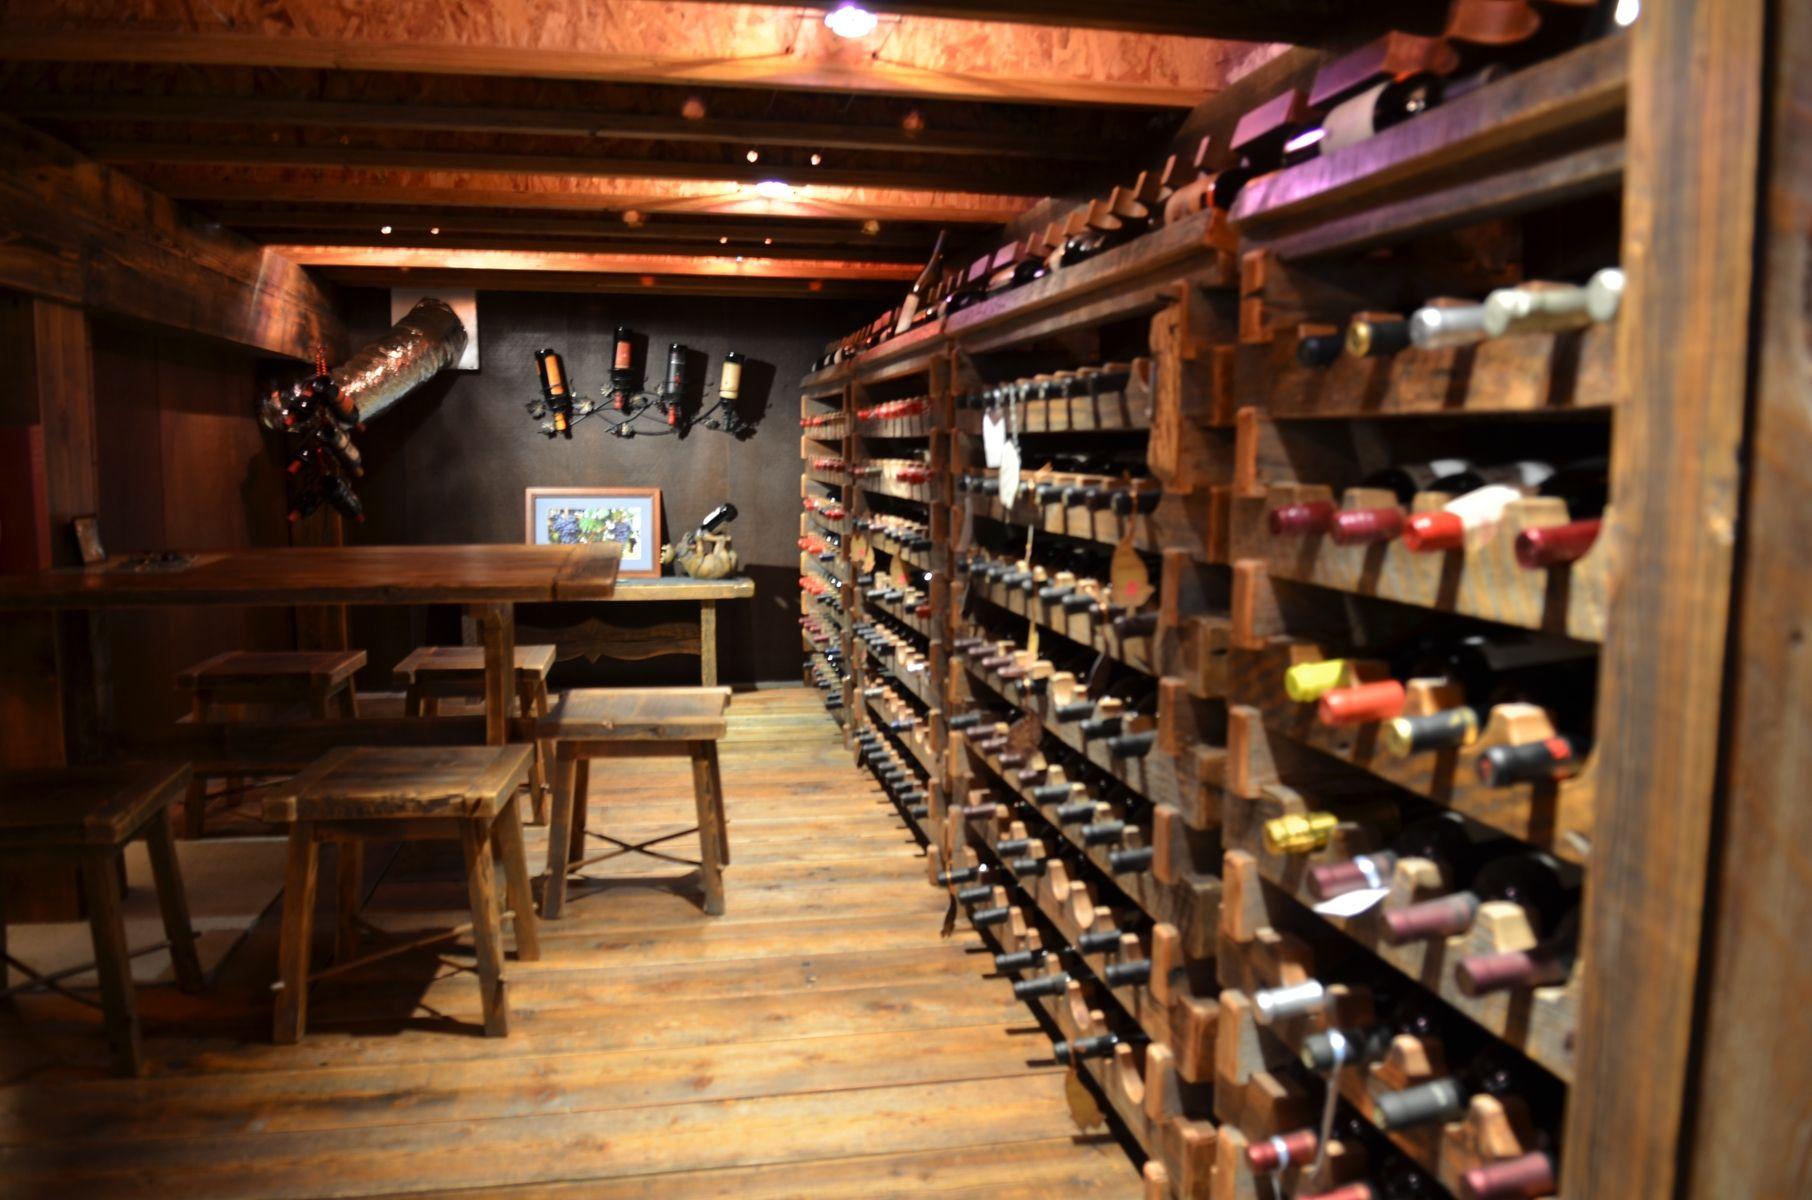 1000 images about organized crawl space on pinterest storage ideas wood bike and garage attic basement wine cellar idea